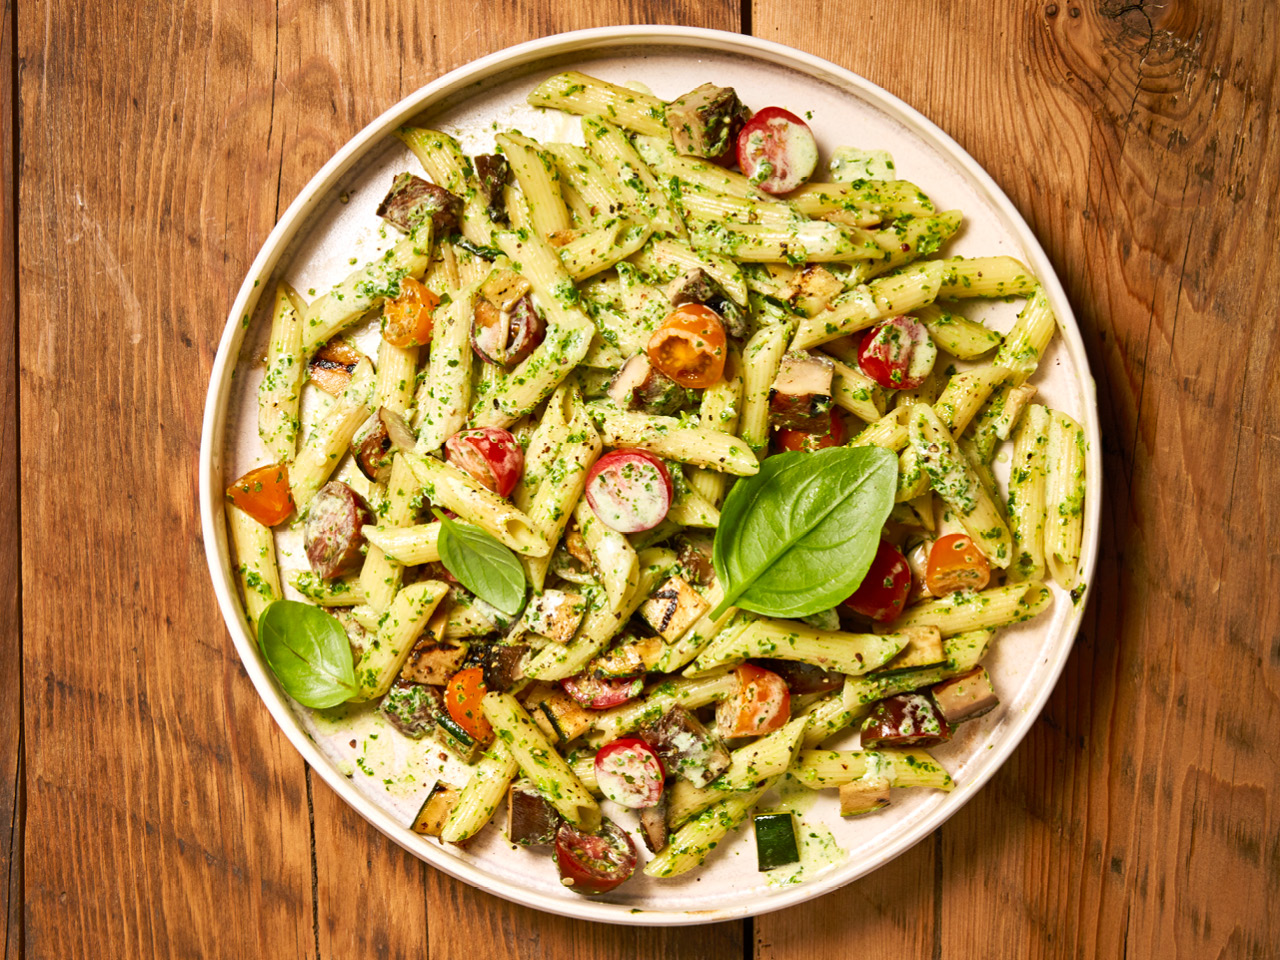 Mushroom, Zucchini & Tomato Pasta Salad